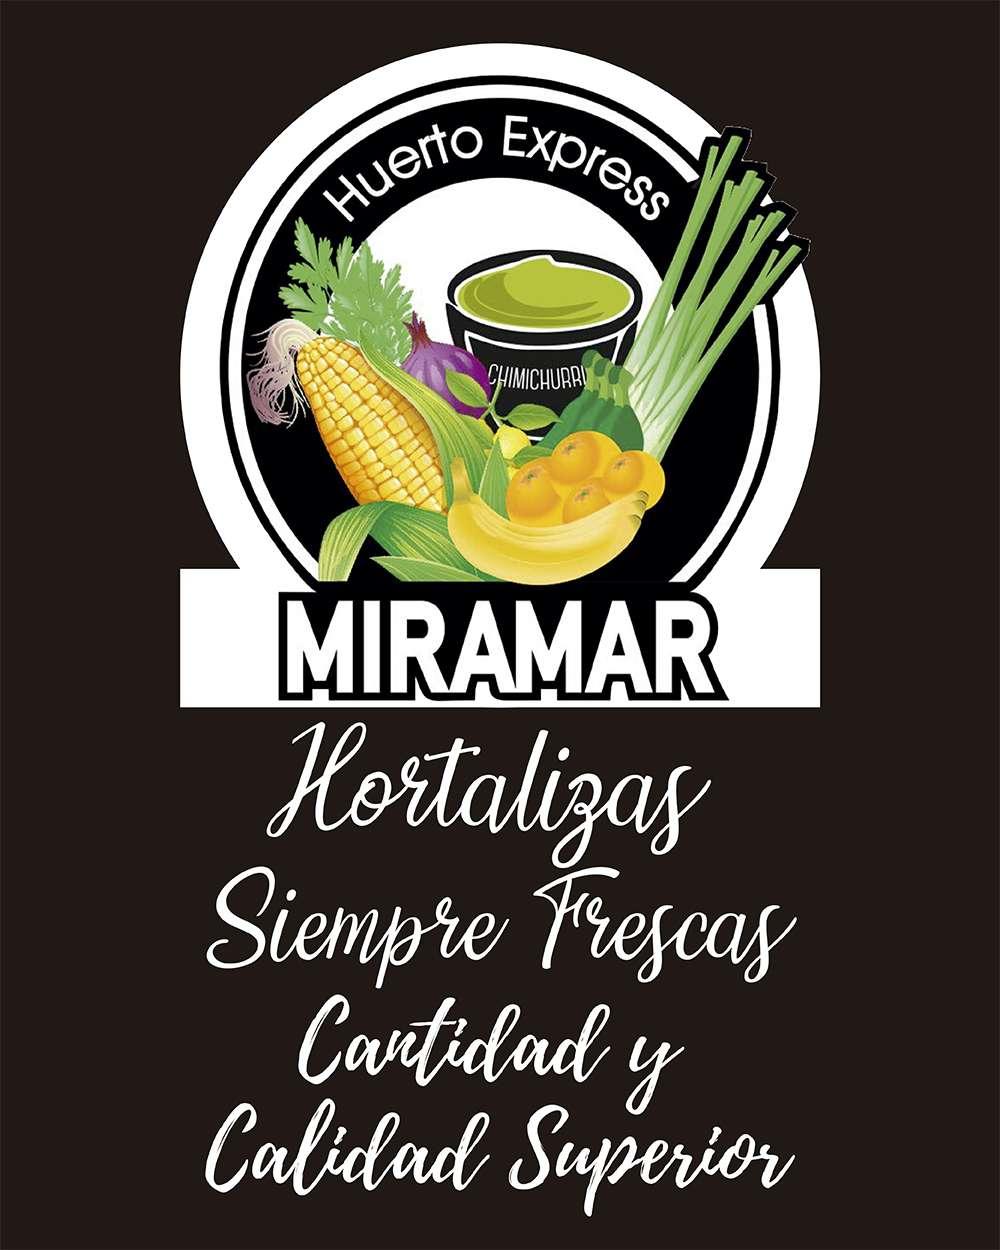 Huerto Express Miramar